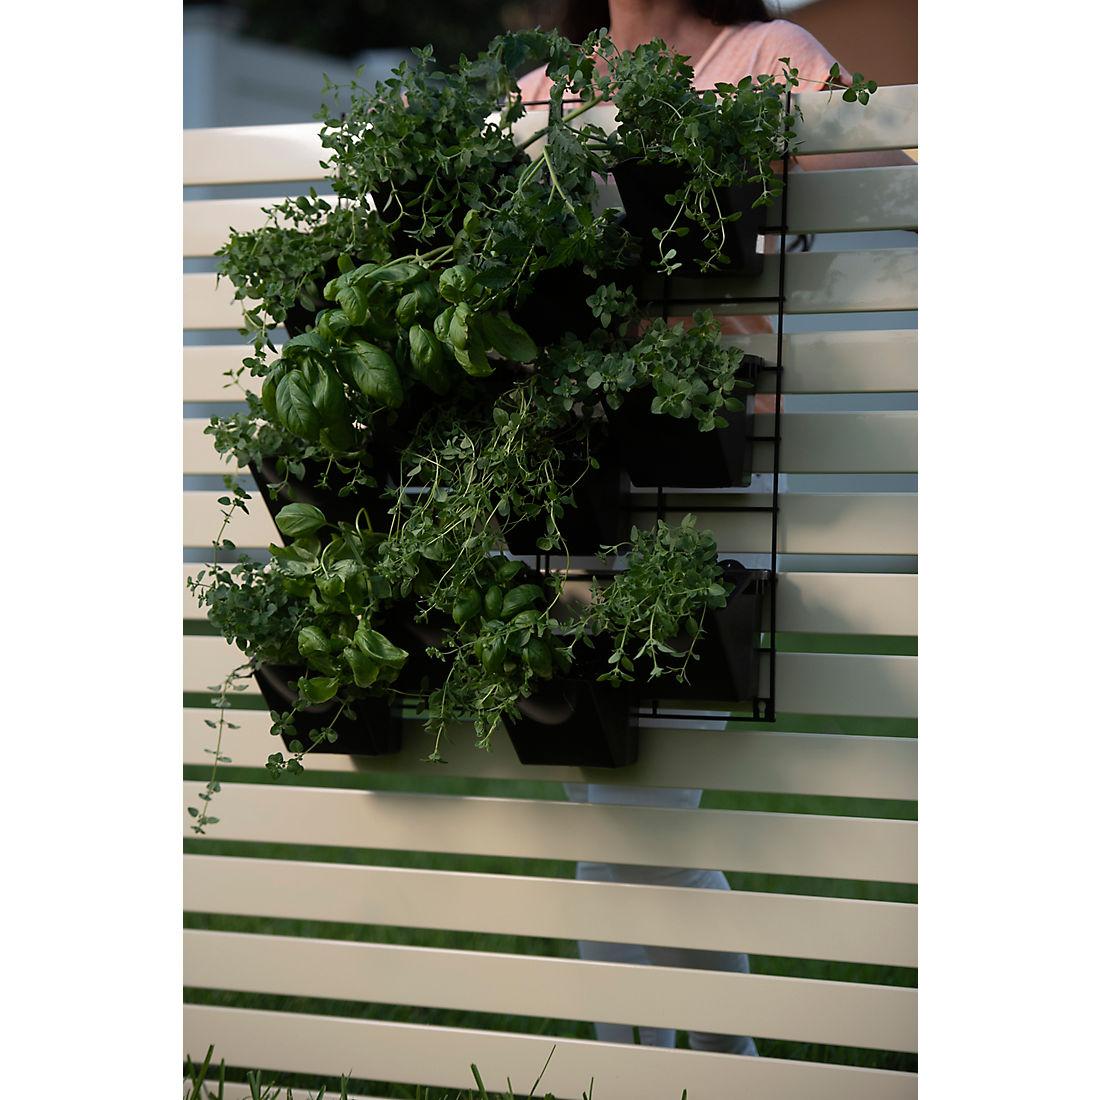 Stratco Vertical Garden Bjs Wholesale Club